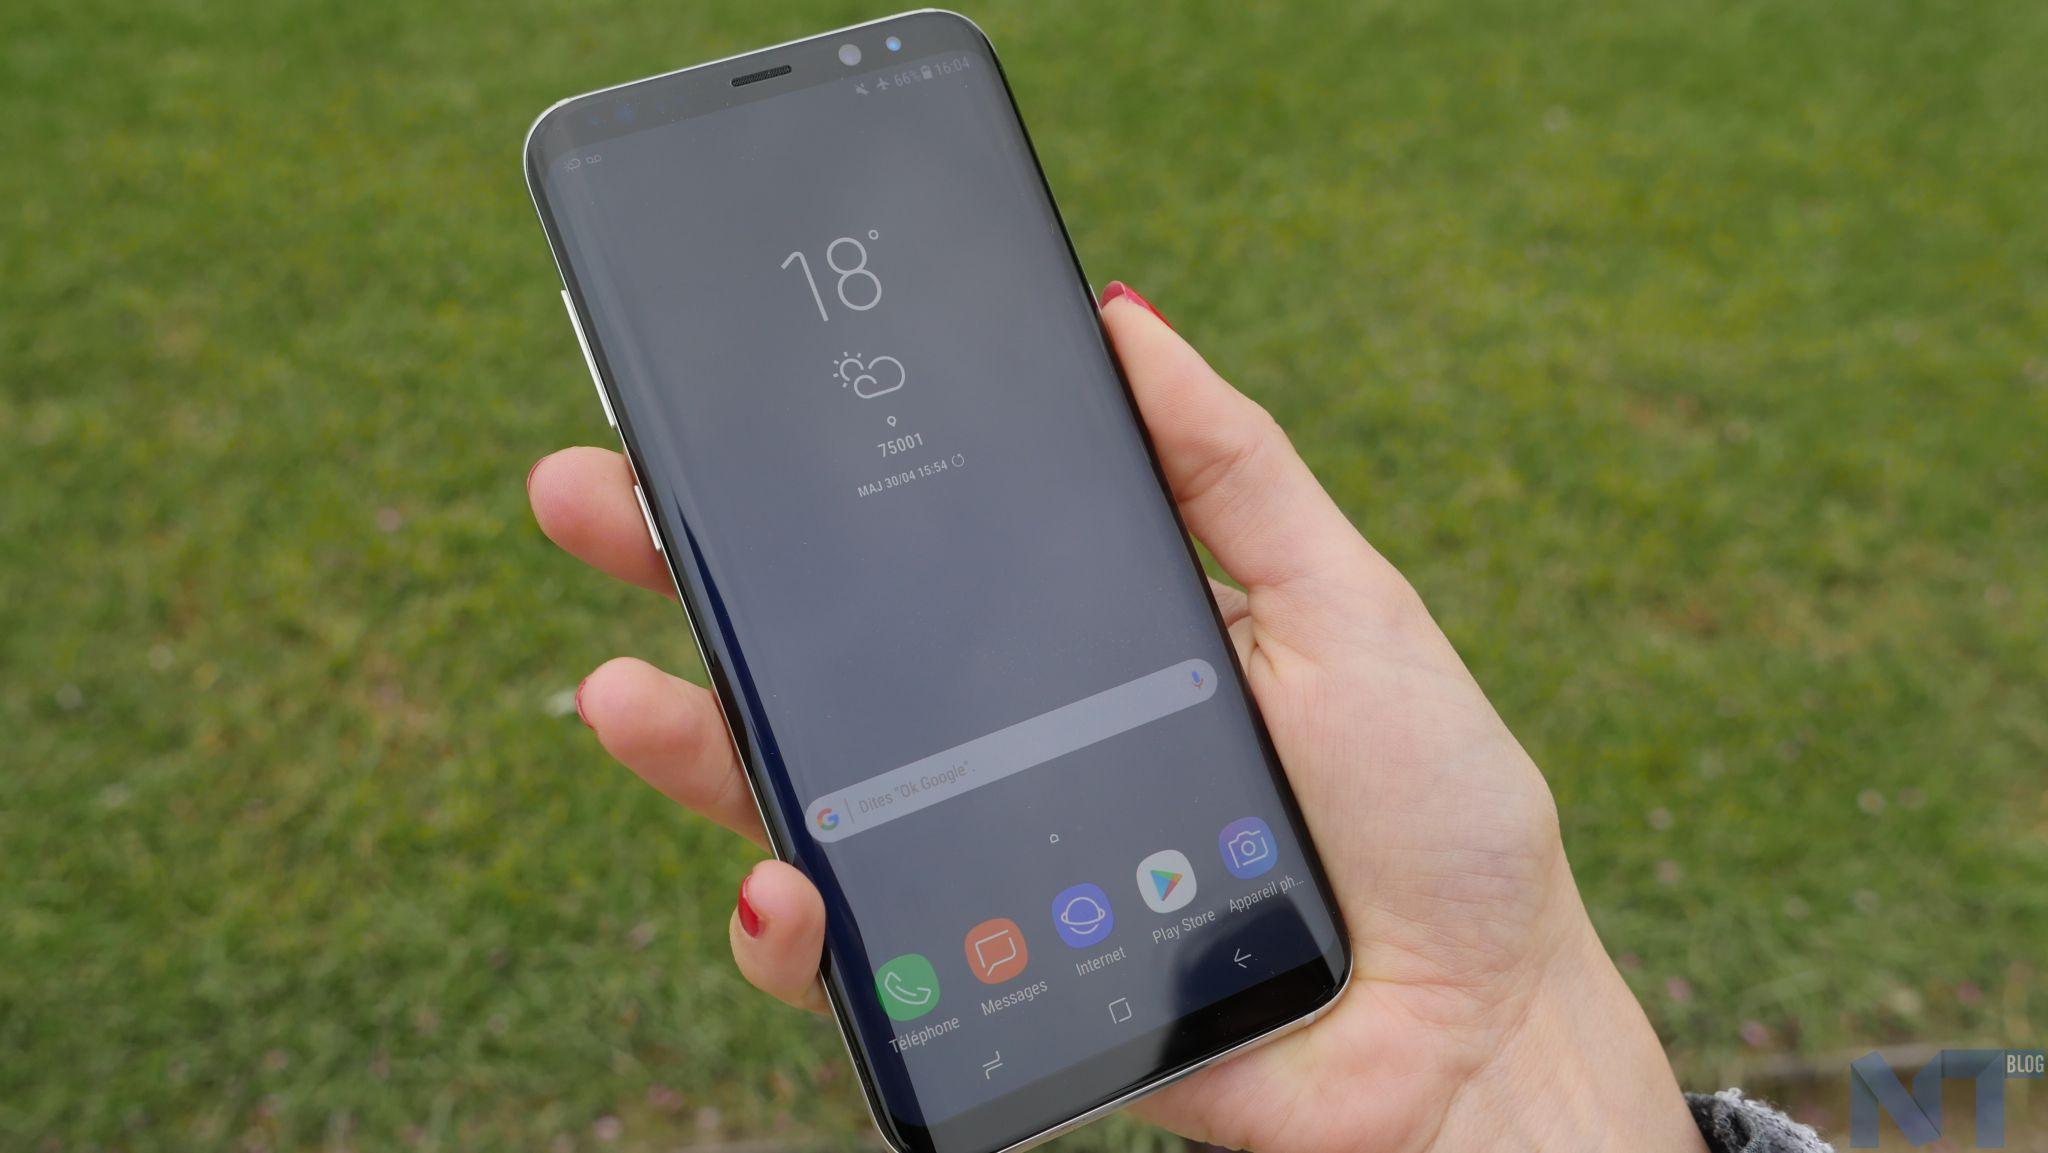 Synaptics va placer un nouveau lecteur d'empreintes digitales sous l'écran des smartphones